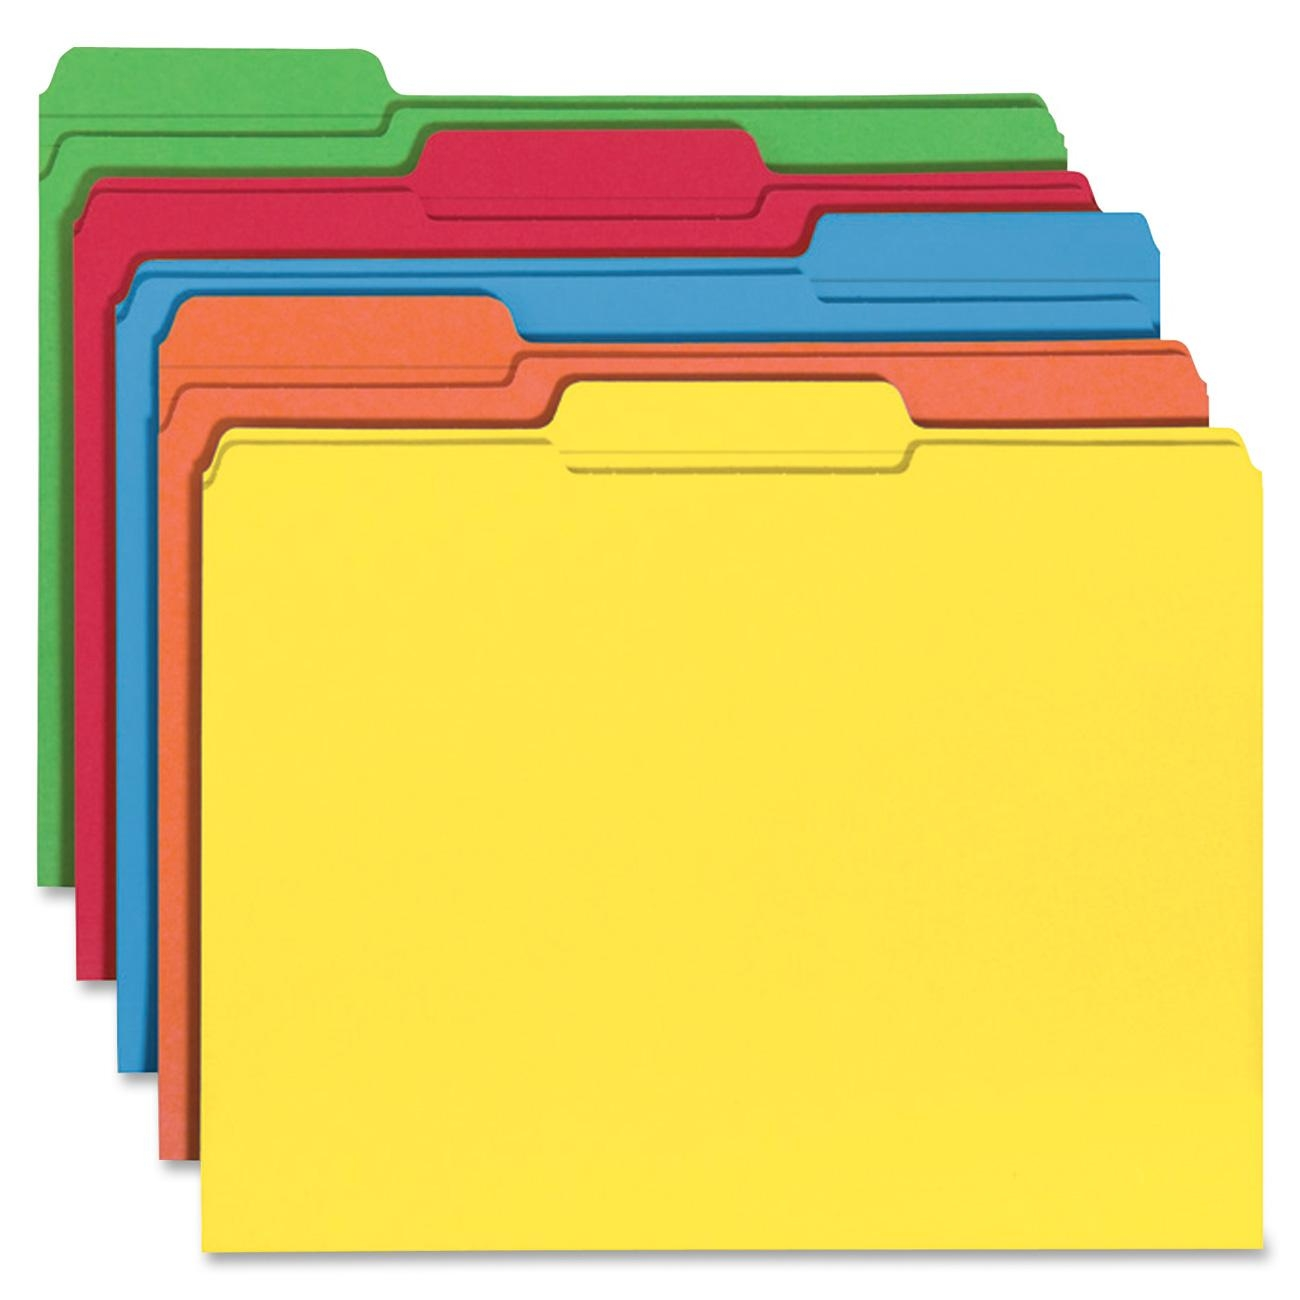 Folder clipart organized file.  clip art clipartlook